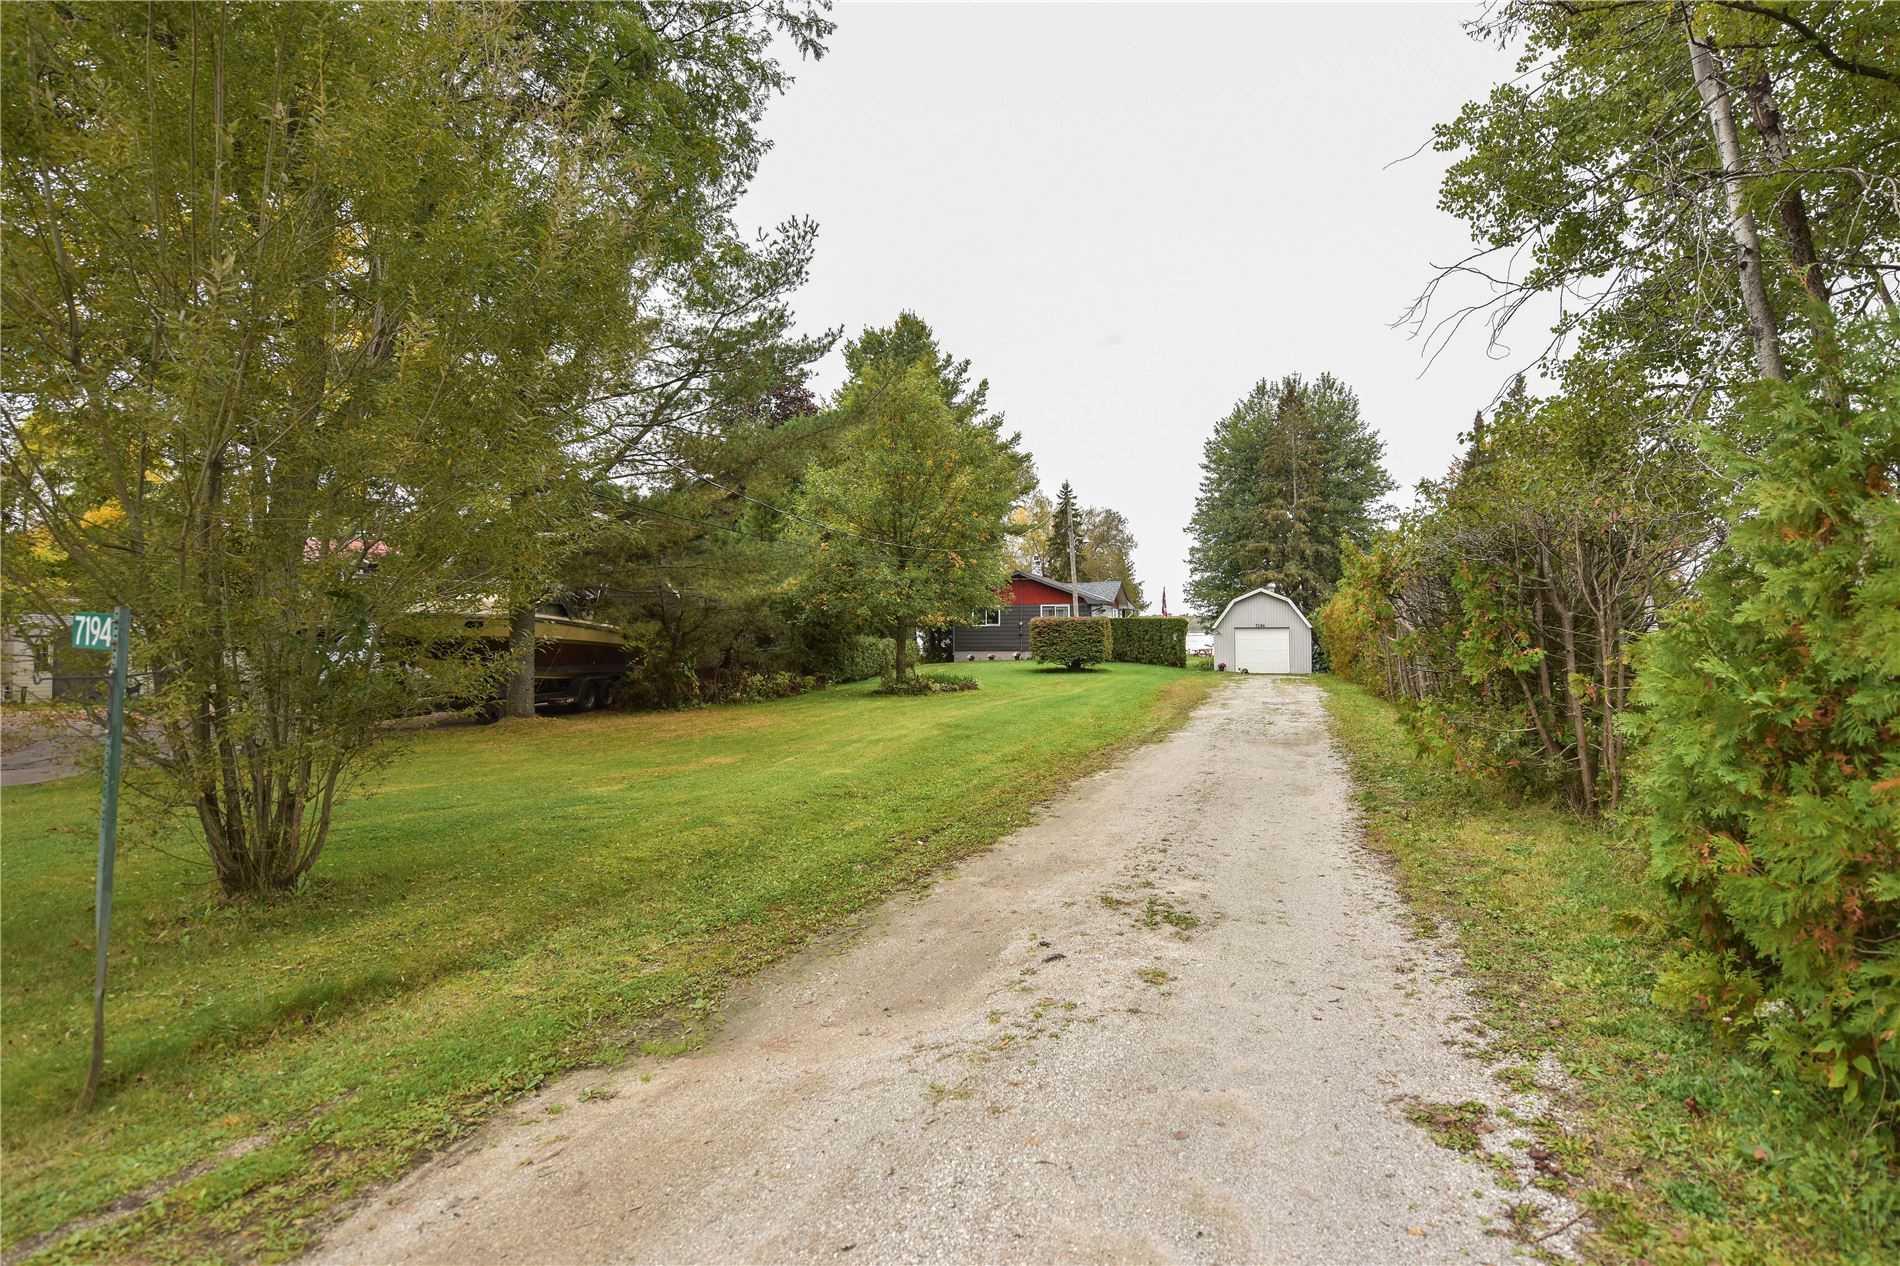 Detached house For Sale In Ramara - 7194 Beach Dr, Ramara, Ontario, Canada L0K 2B0 , 2 Bedrooms Bedrooms, ,1 BathroomBathrooms,Detached,For Sale,Beach